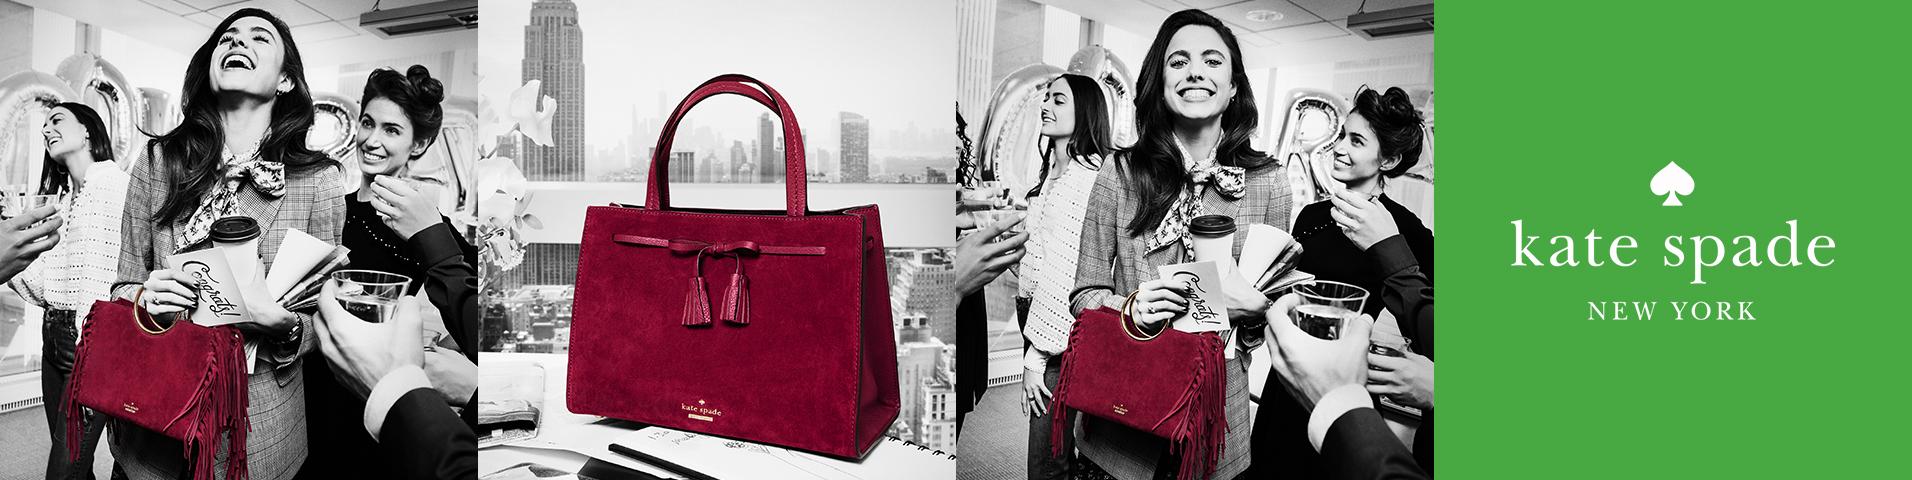 Kate De Moda Spade Online Colecciones Comprar New York Premium SdRUdvnqZ